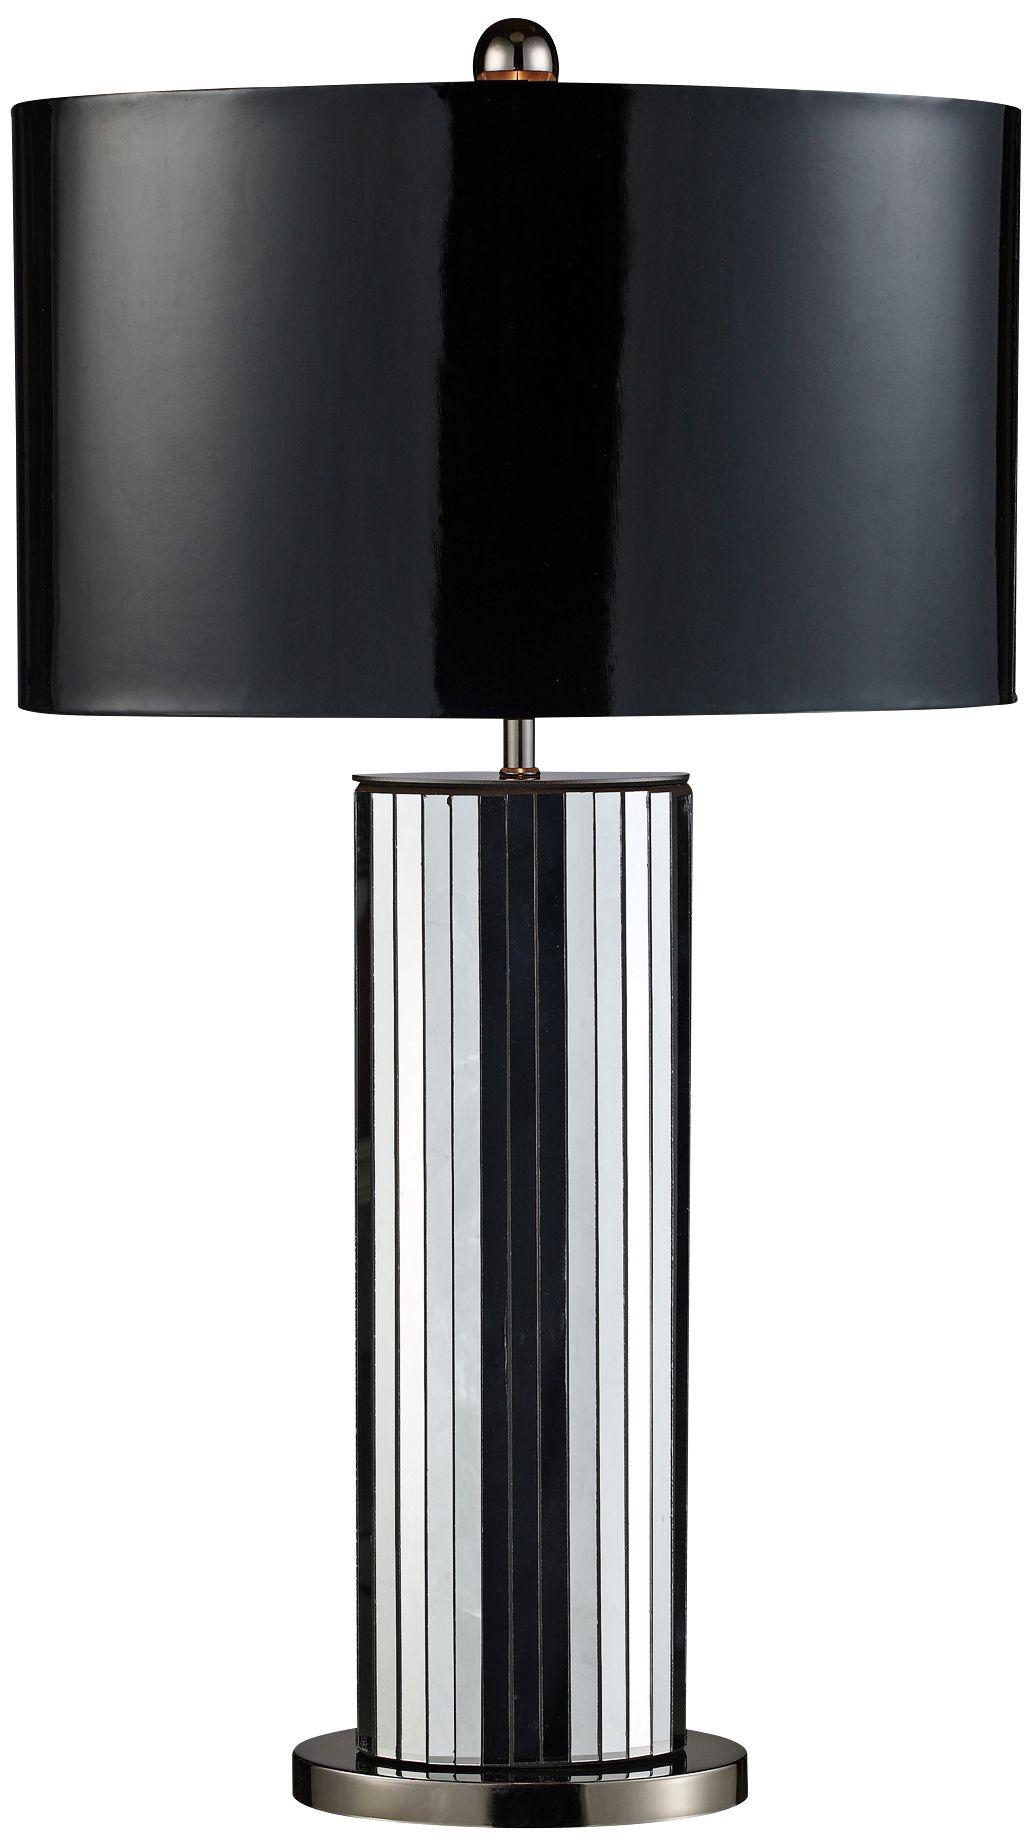 Dimond Shreve Black Chrome Mirror Table Lamp